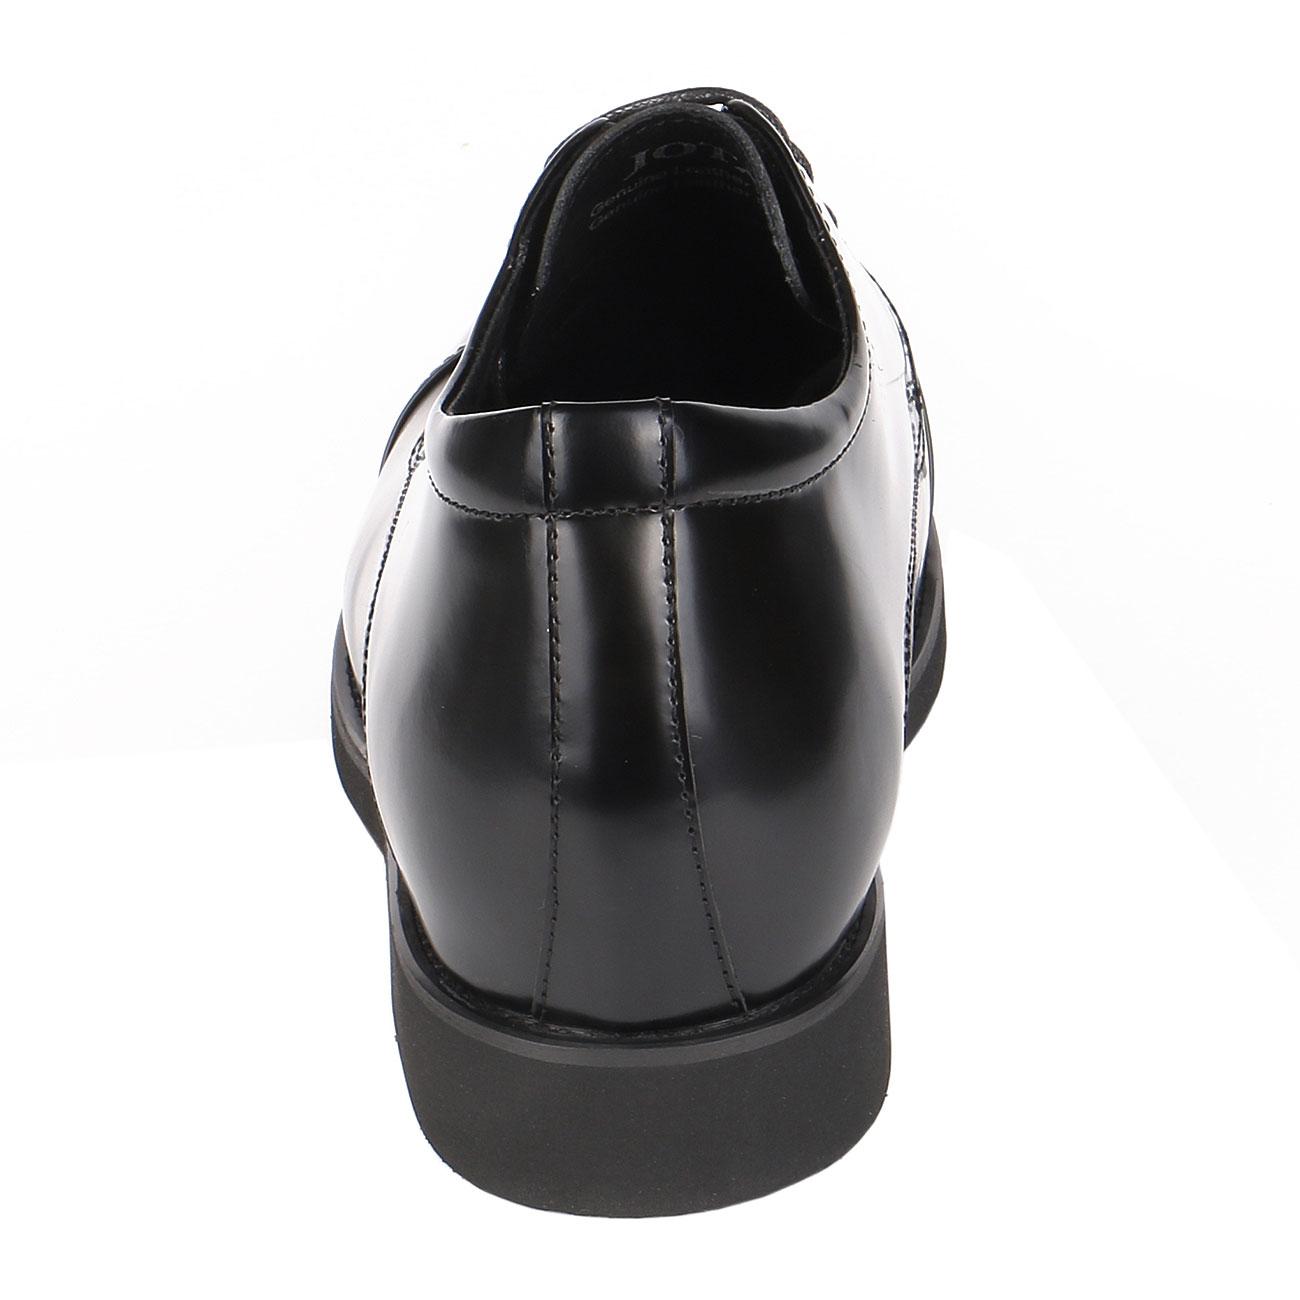 High Heels for Short Men